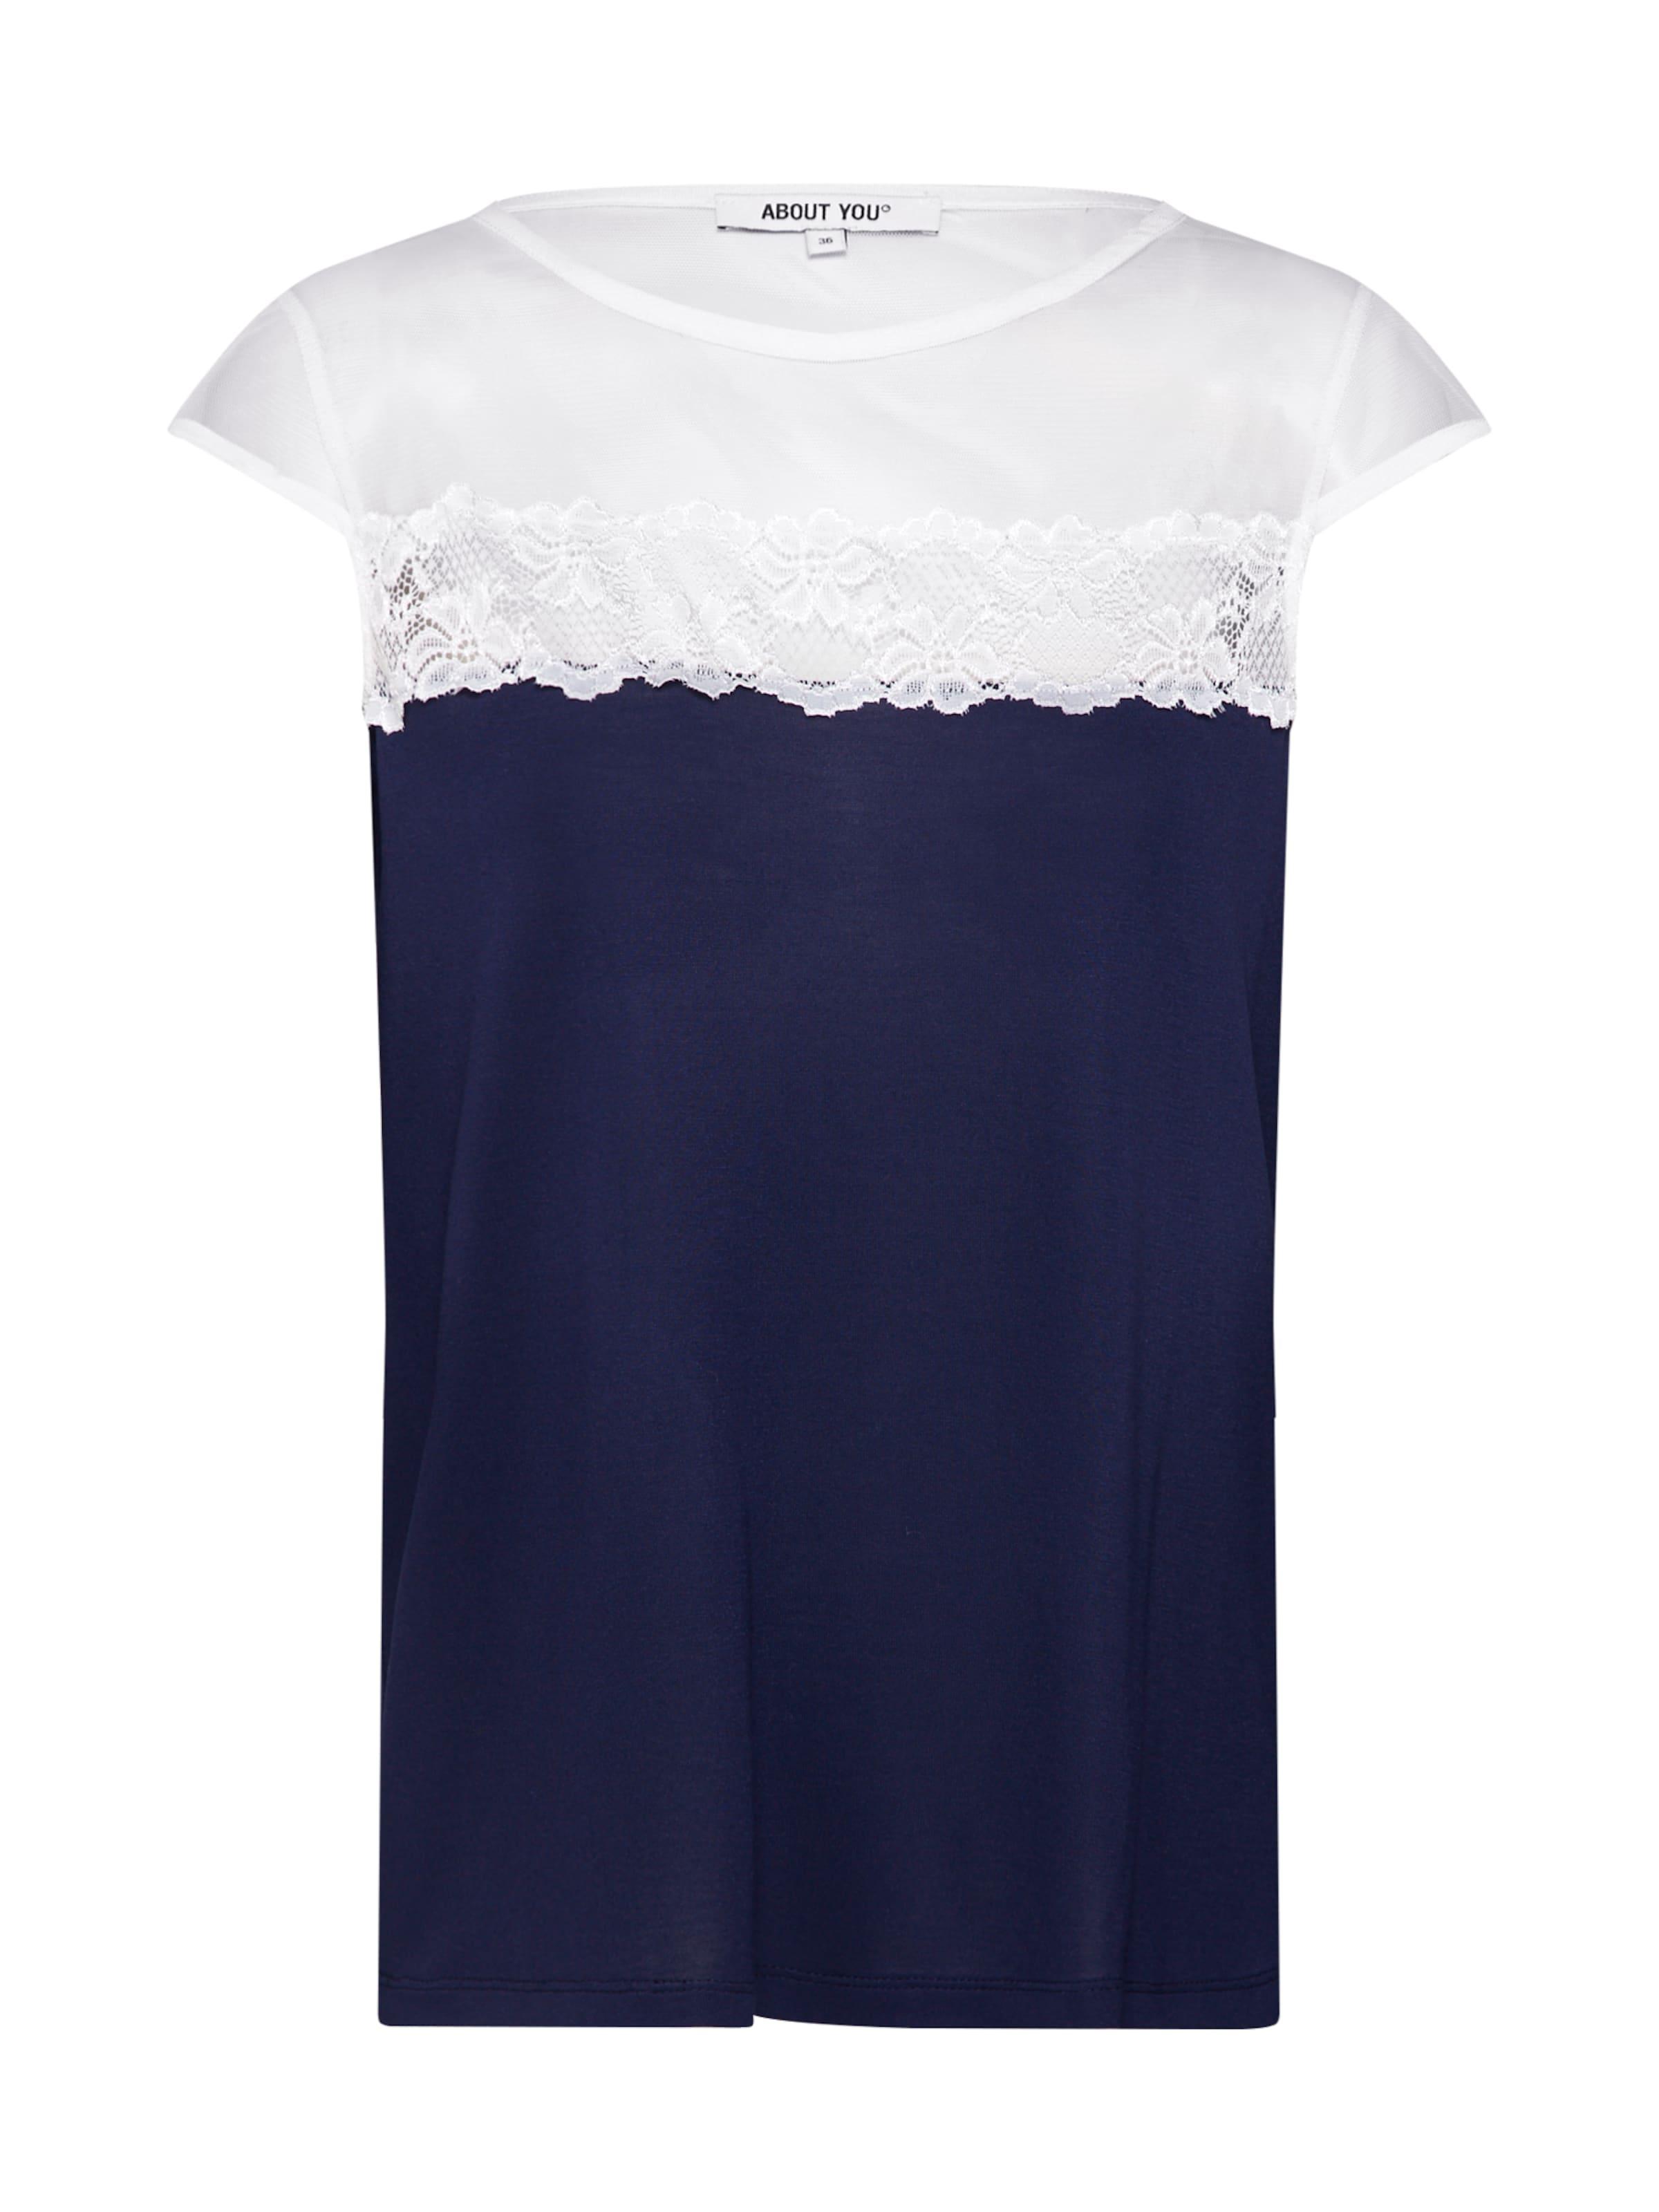 En Shirt' MarineFoncé 'viola About T shirt You Bleu wP80knO